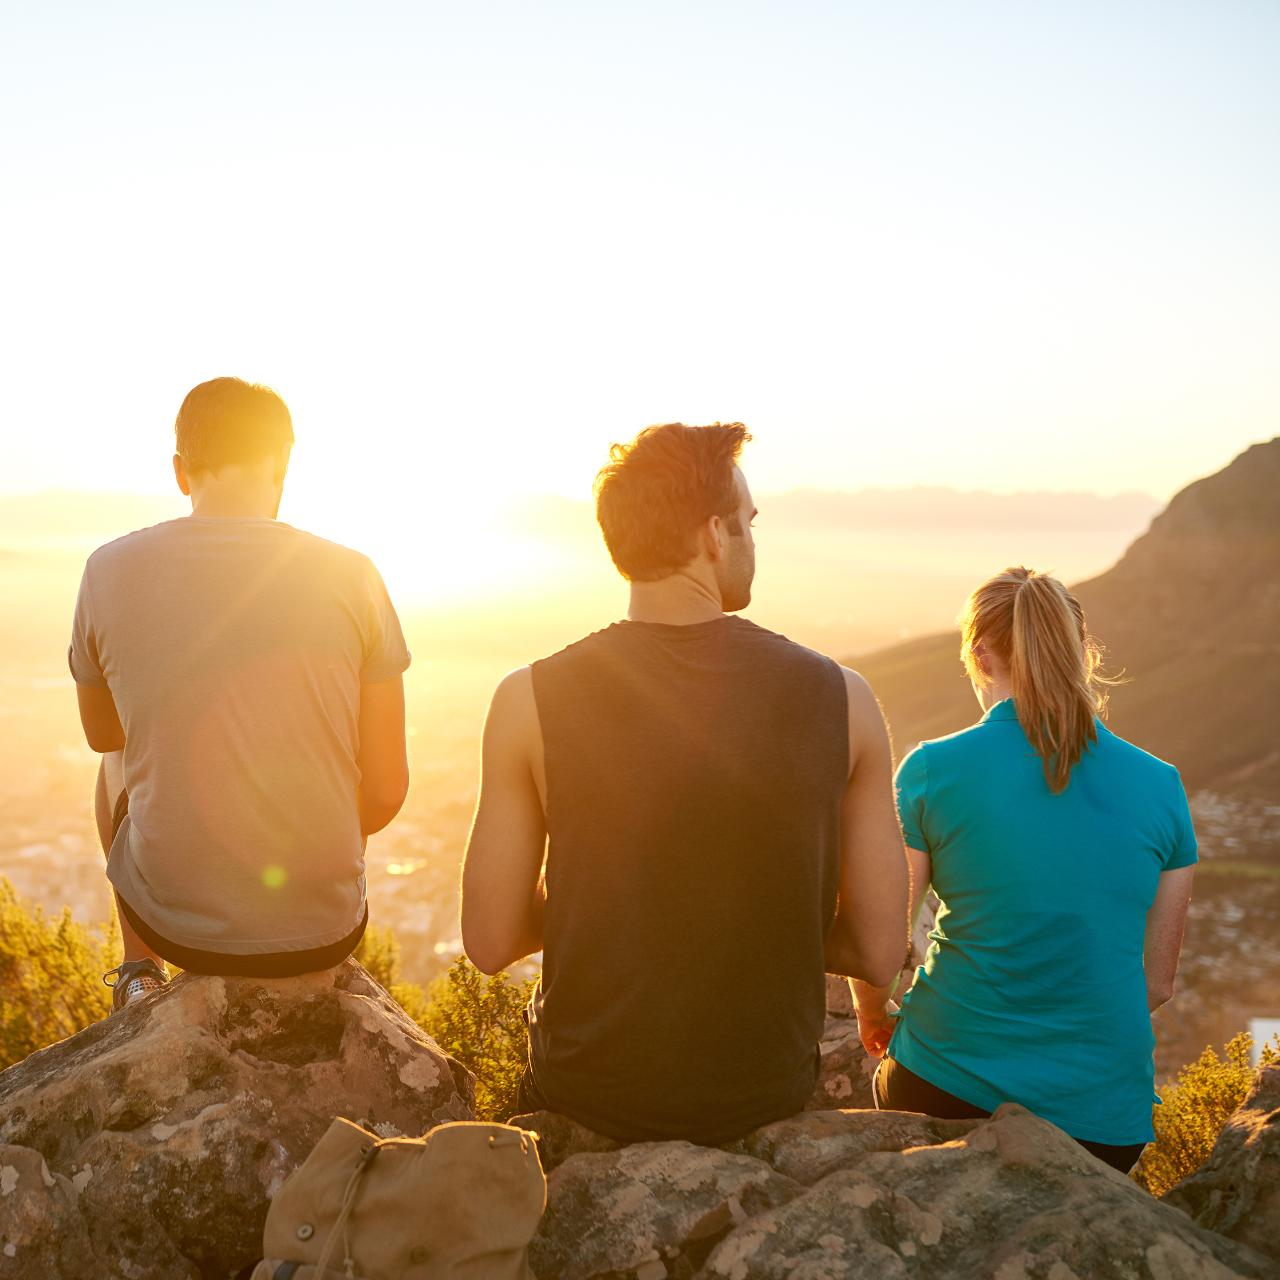 Mornington Peninsula Adventure - Hike, Yoga, Wineries